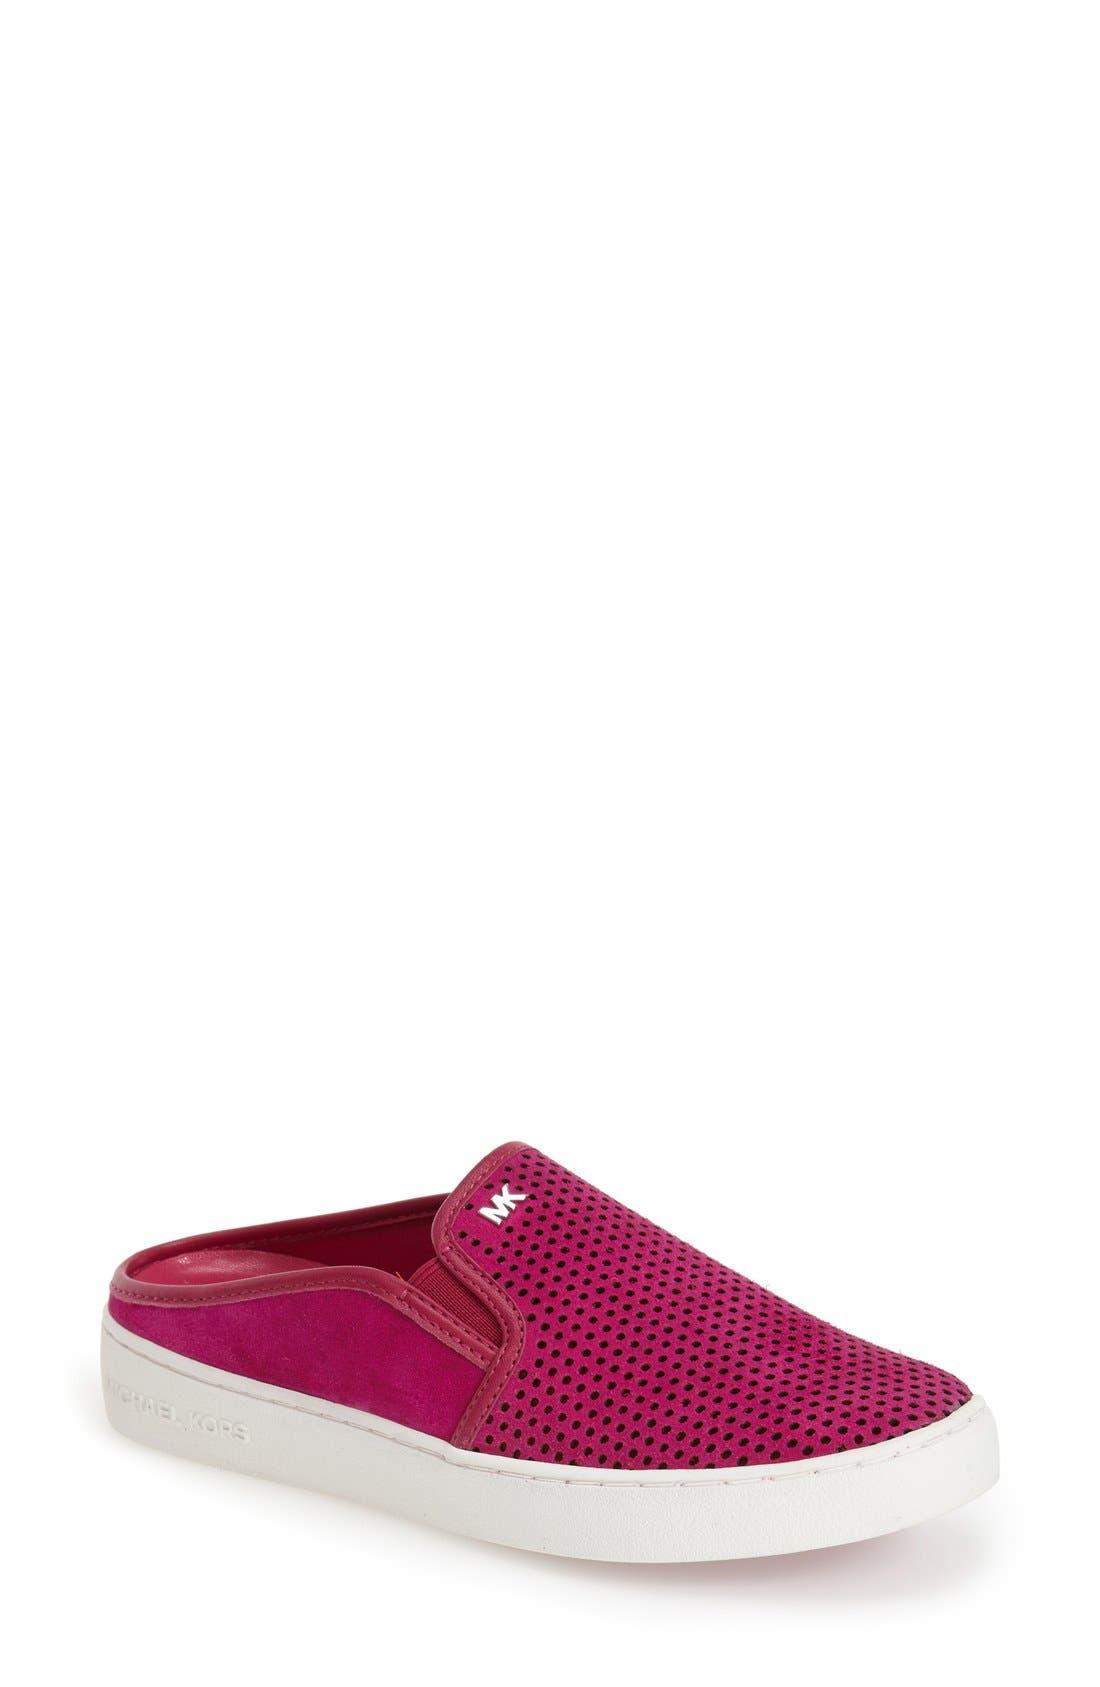 Alternate Image 1 Selected - MICHAEL Michael Kors 'Brett' Perforated Slip-On Mule Sneaker (Women)